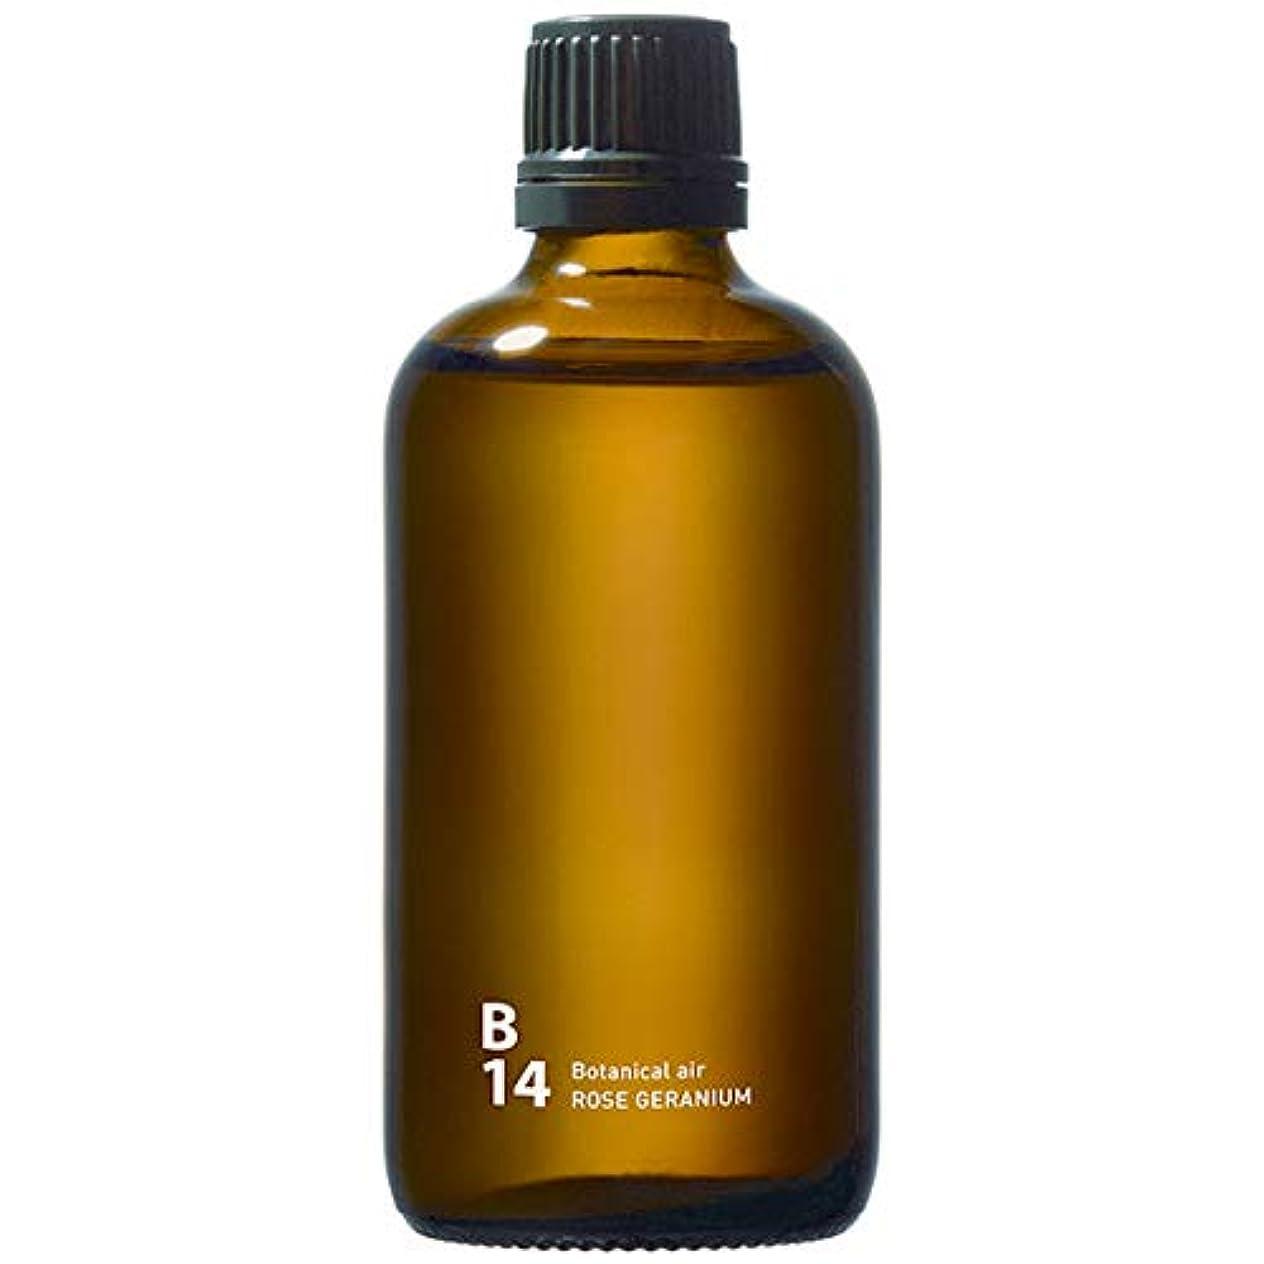 脈拍ミス地中海B14 ROSE GERANIUM piezo aroma oil 100ml